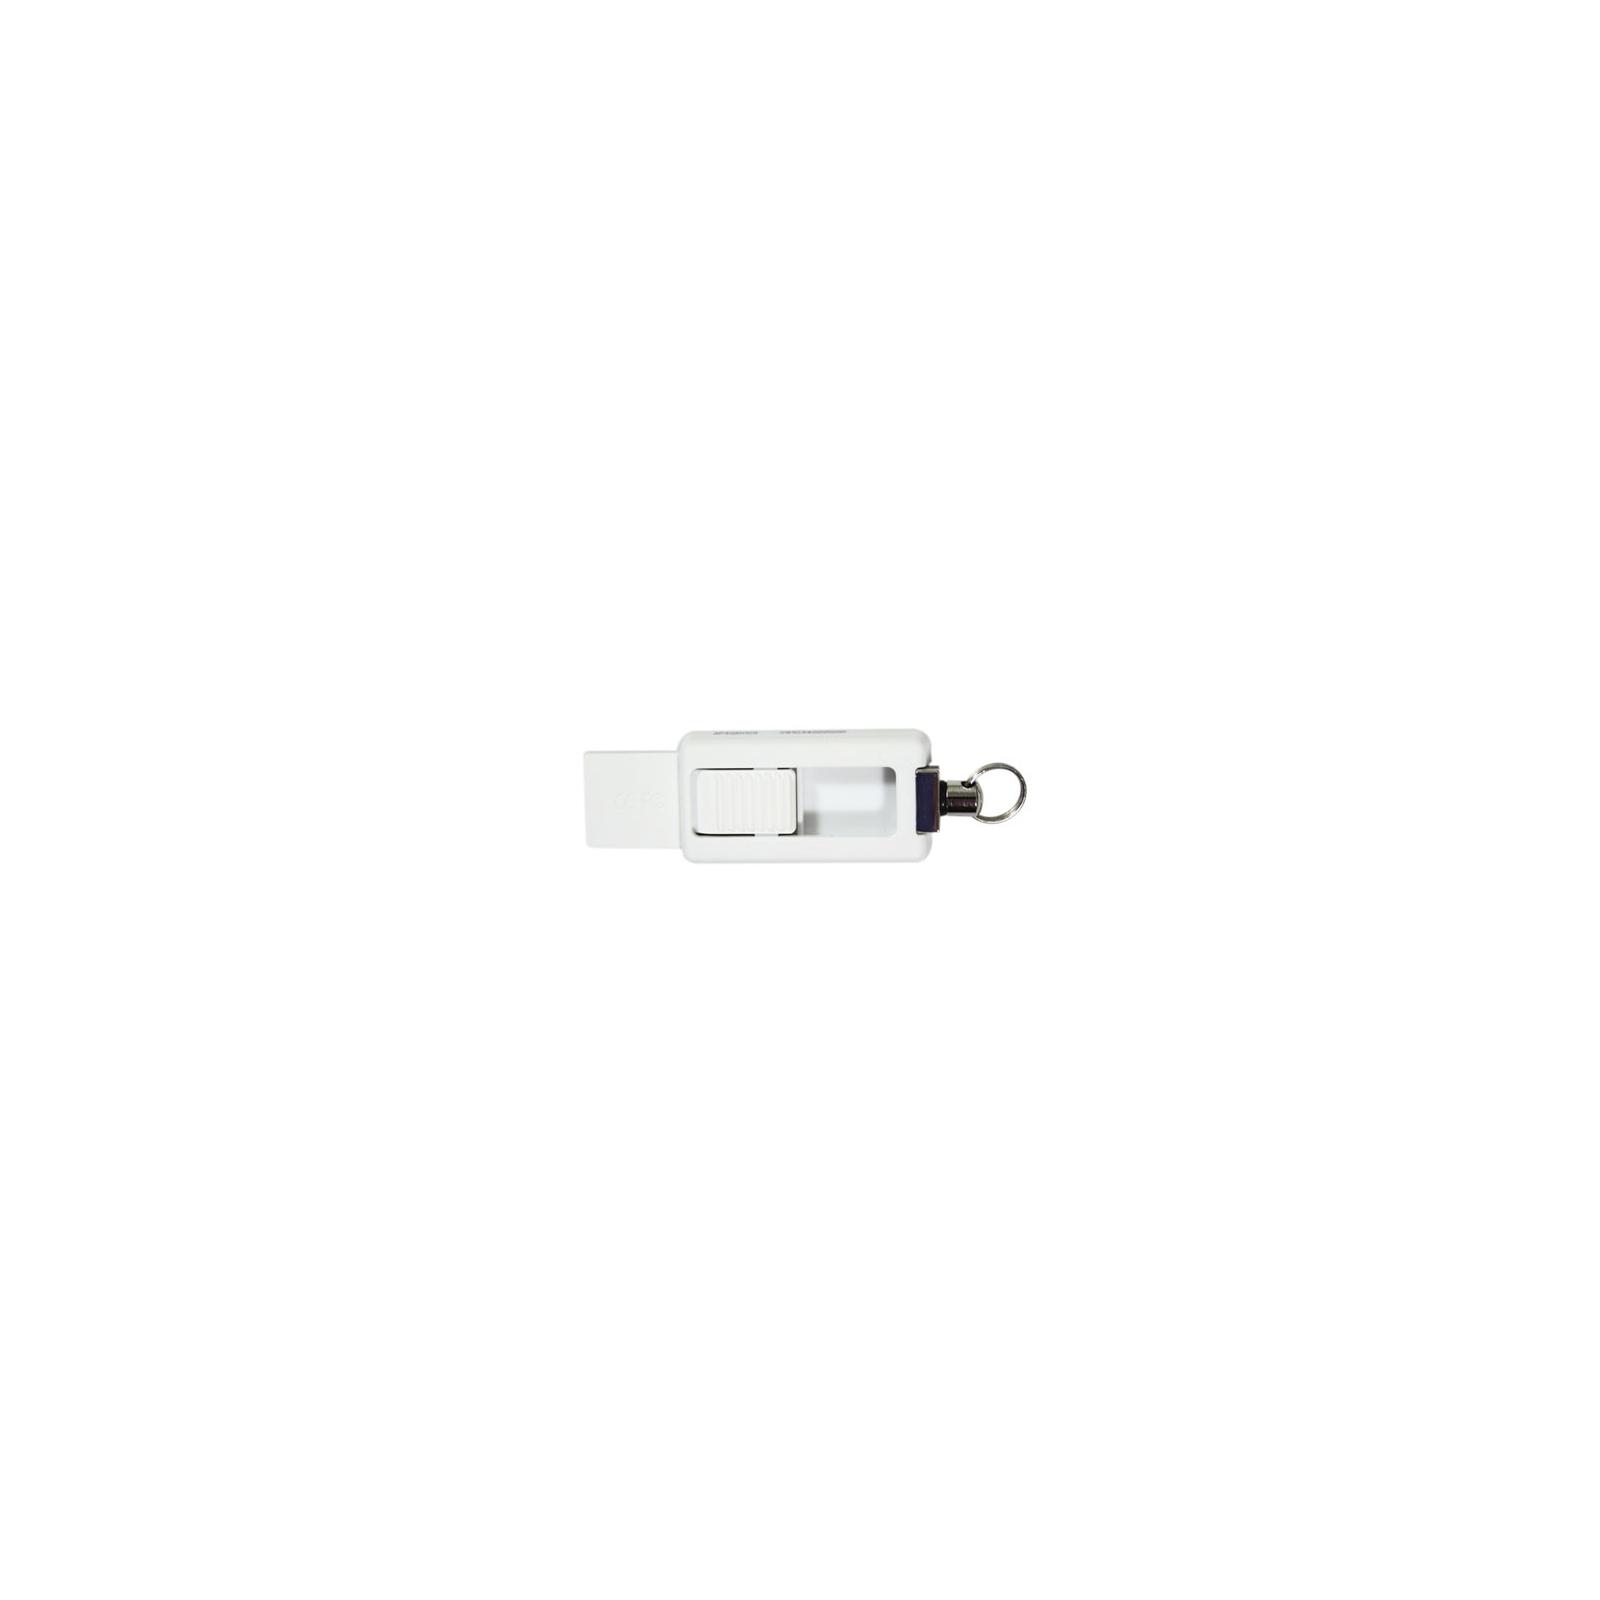 USB флеш накопитель 8GB AH129 Tiffany Blue RP USB2.0 Apacer (AP8GAH129G-1) изображение 3